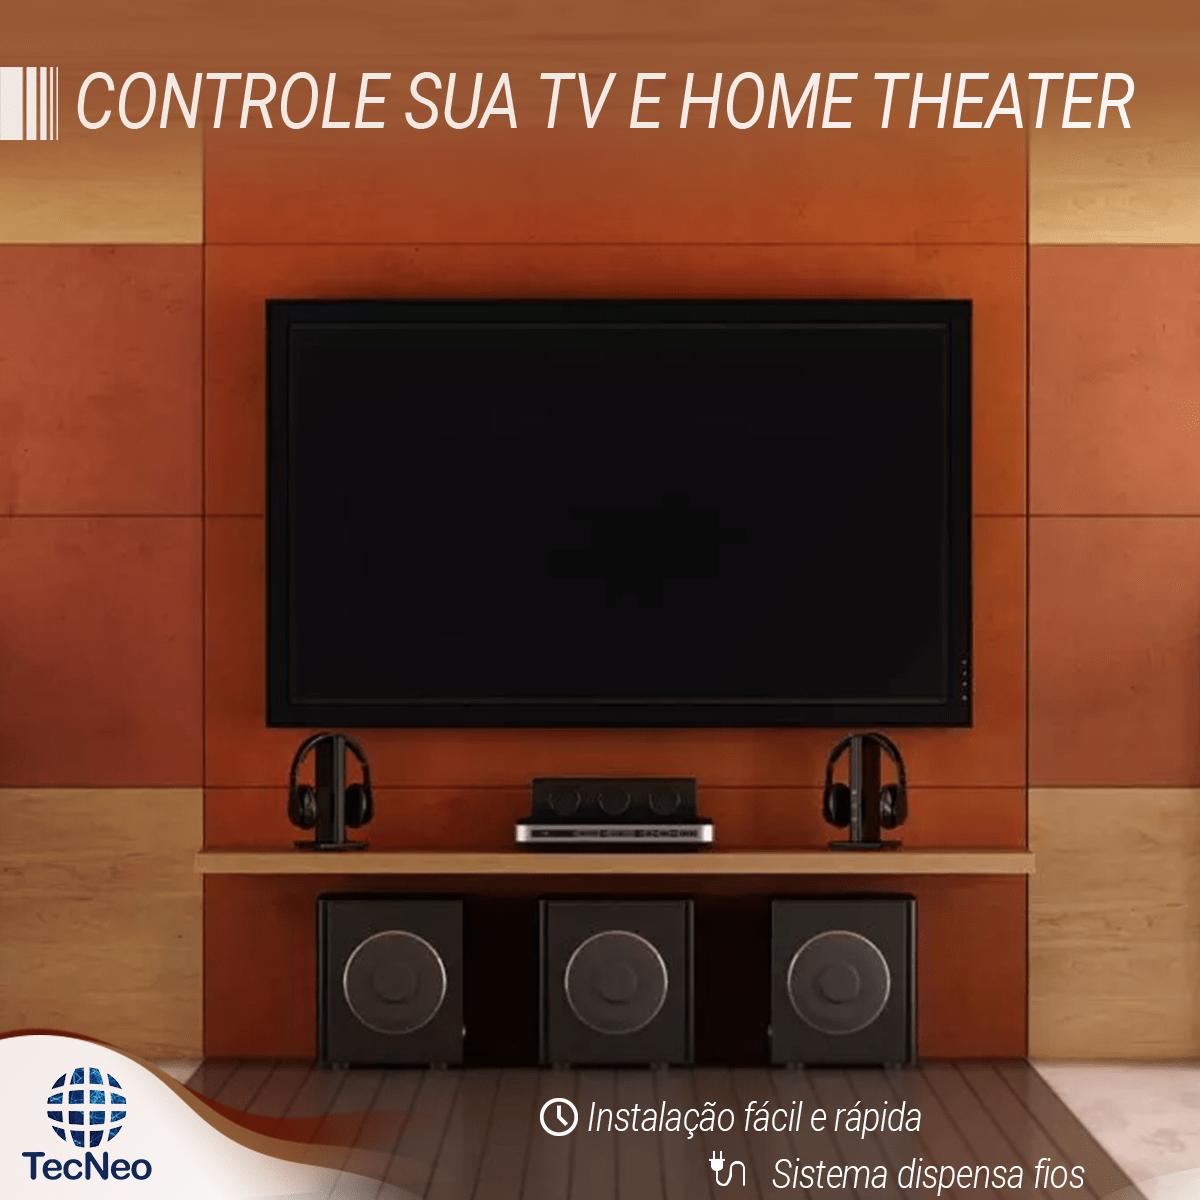 Controle sua Tv e Home Theater